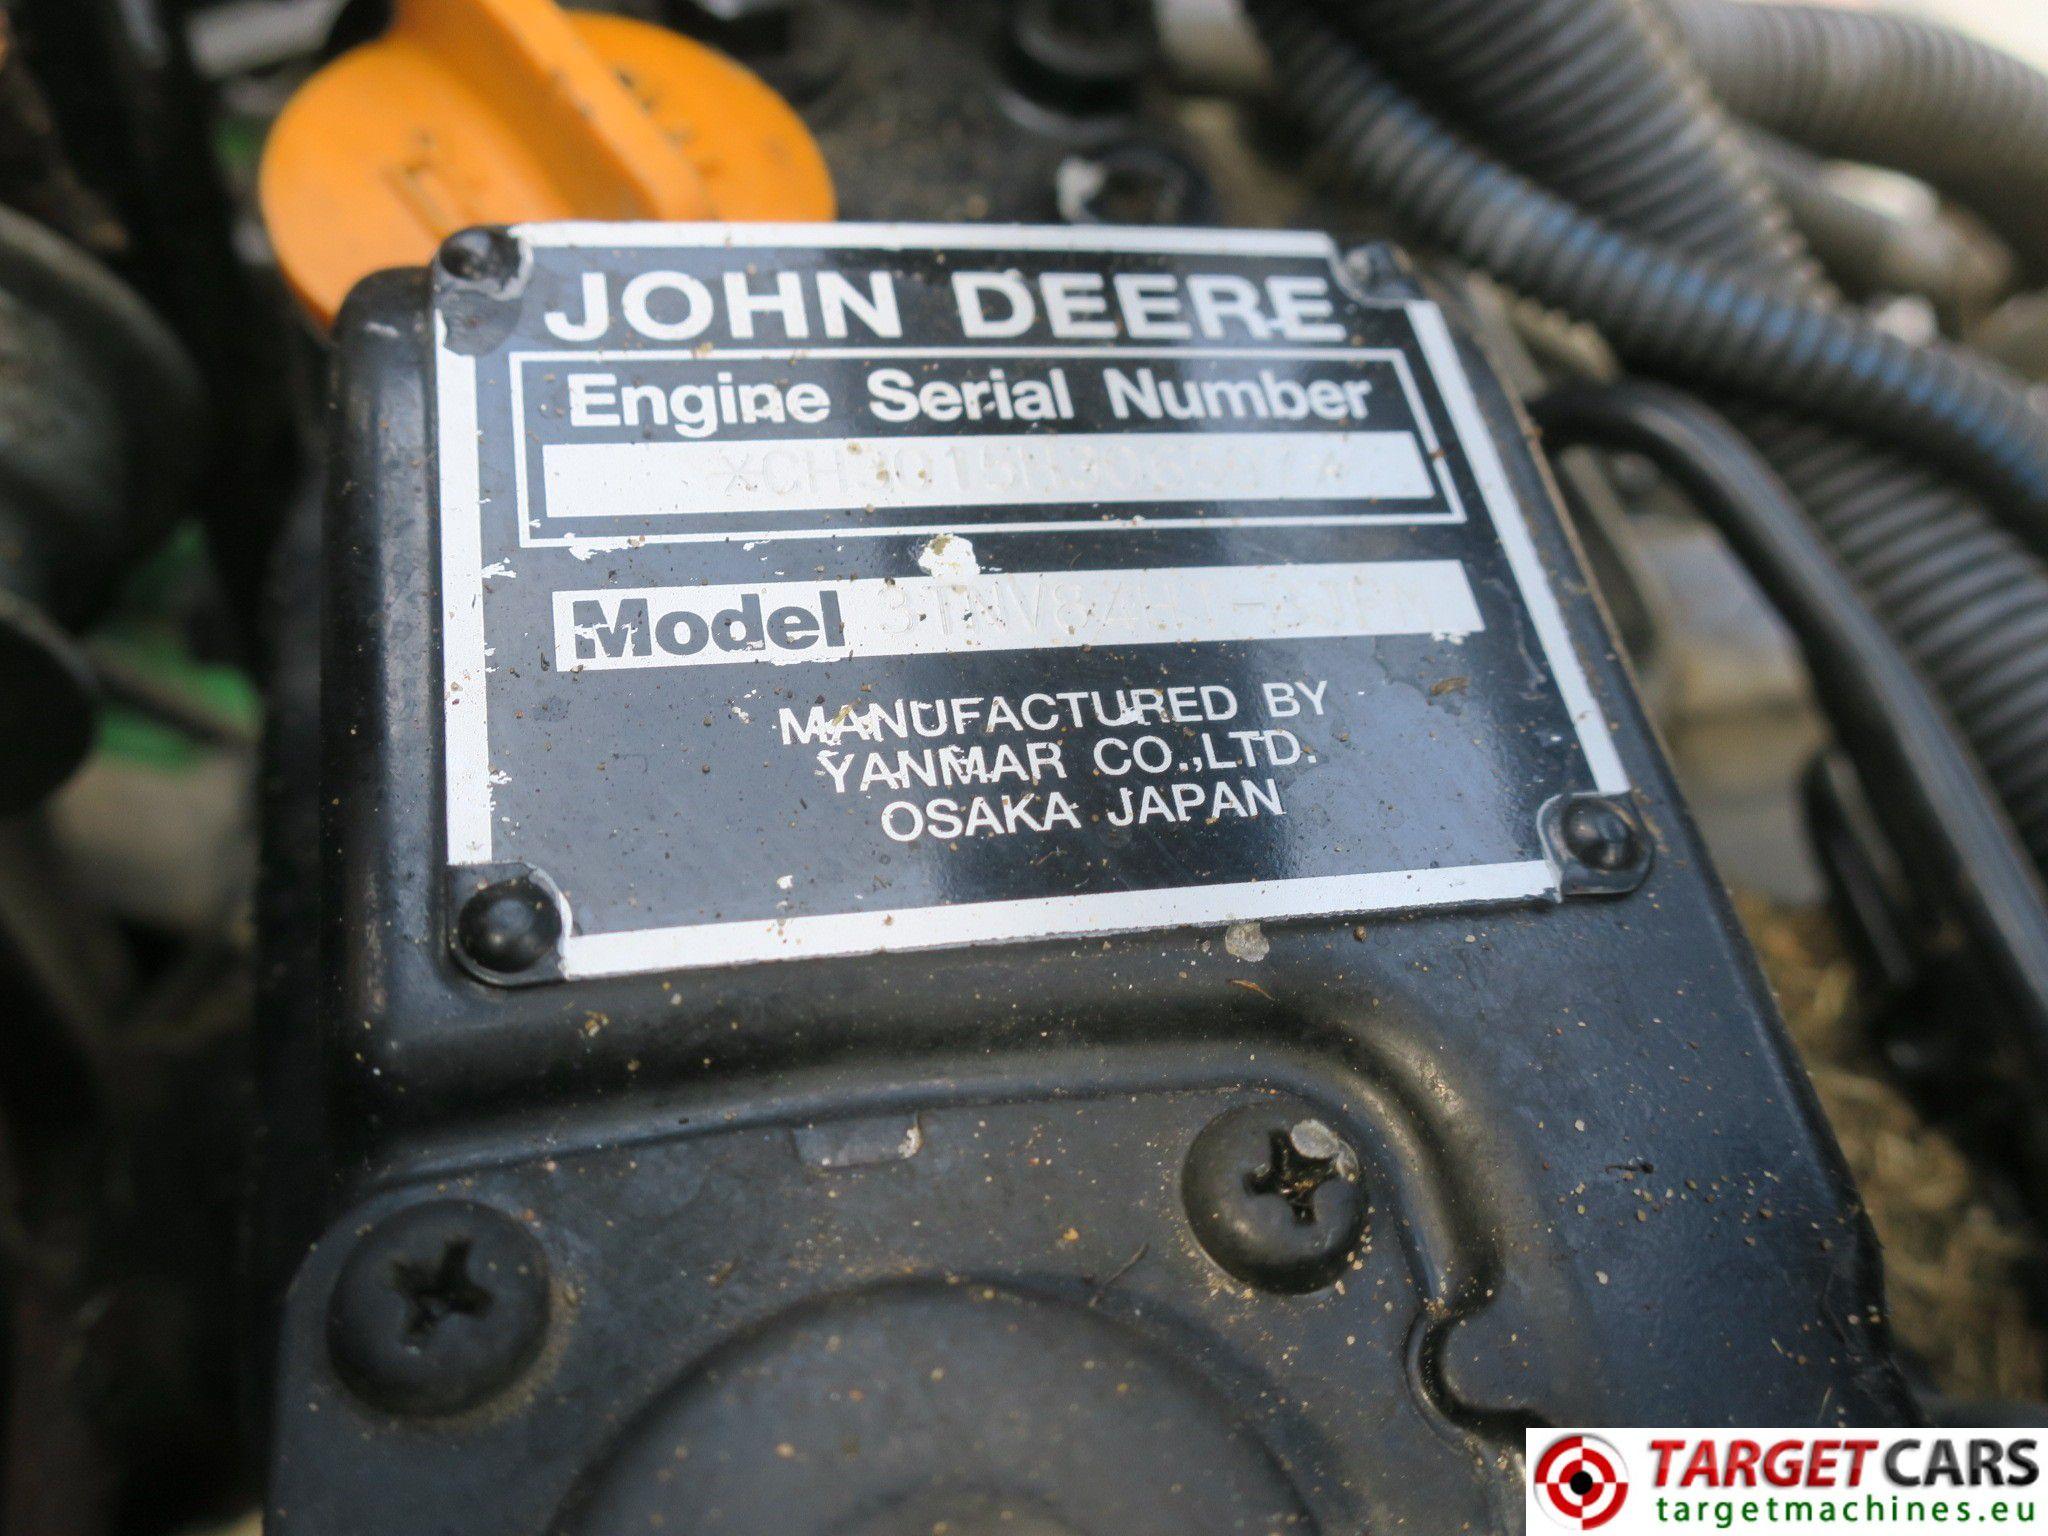 JOHN DEERE 8700 PRECISION CUT 5 GANG HYDROSTATIC CYLINDER 254CM WIDTH MOWER  2008